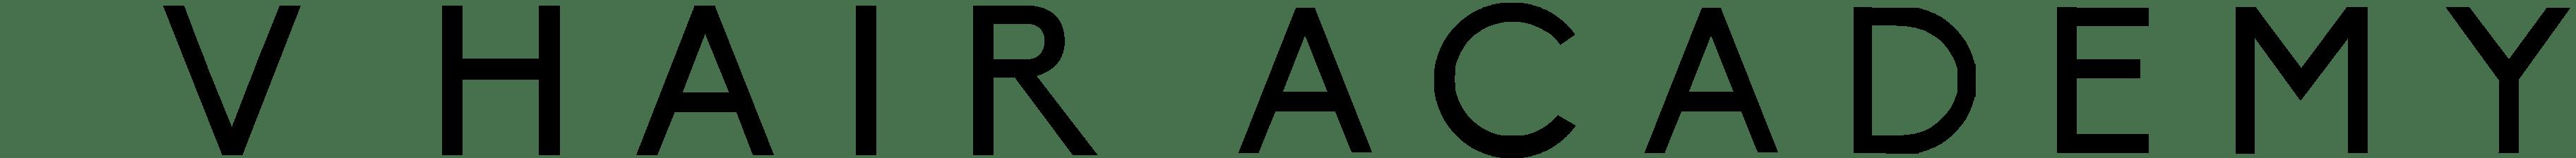 VHair Academy Logo Head Dark with gap